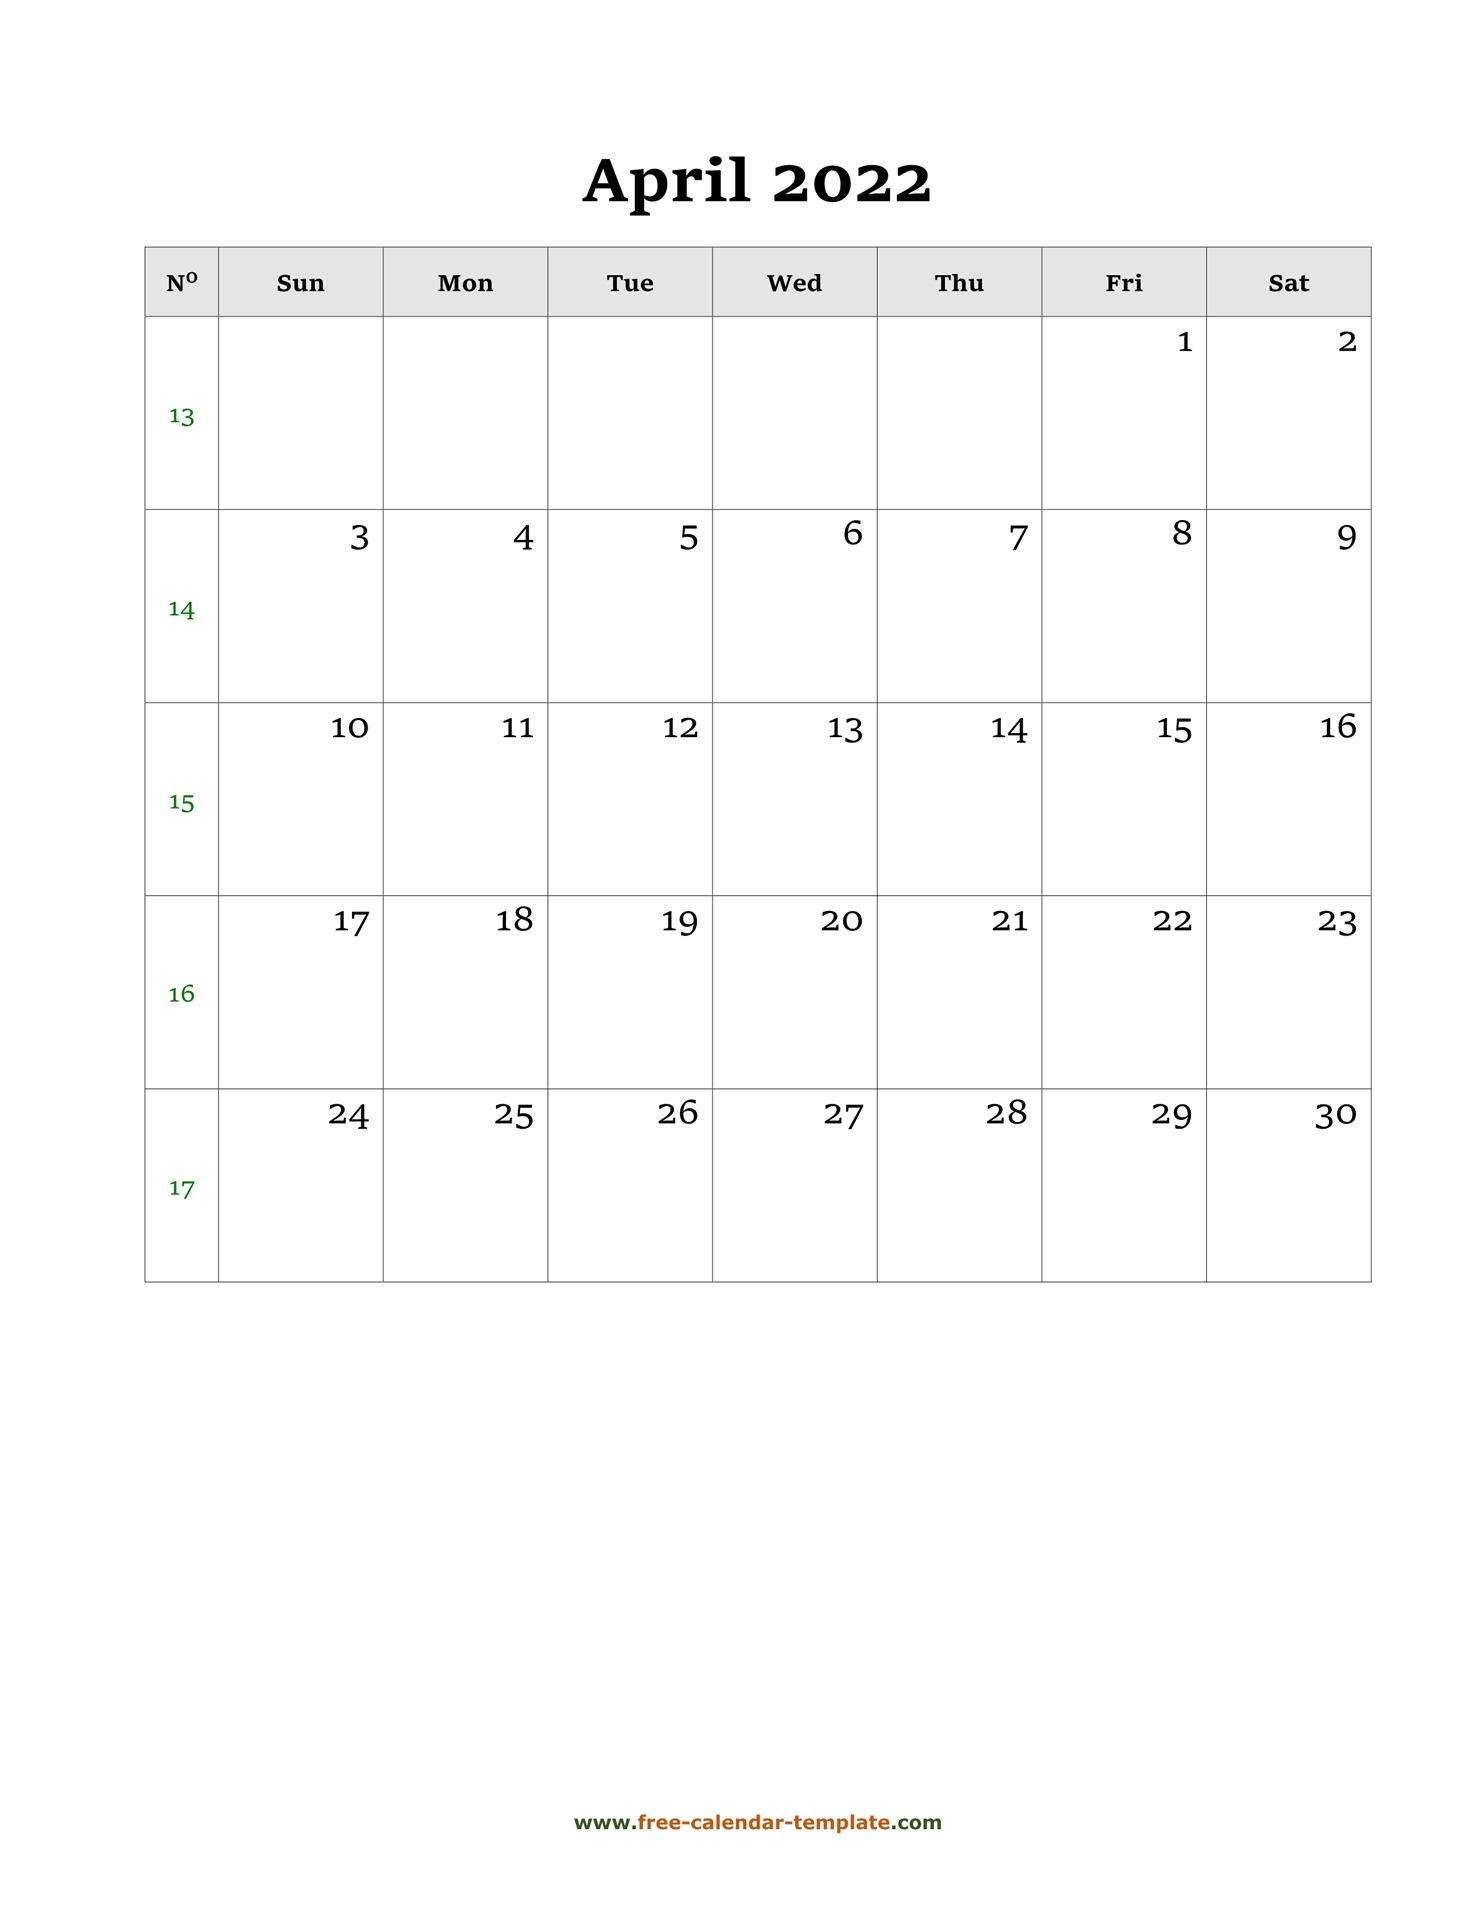 April Calendar 2022 Simple Design With Large Box On Each Regarding March And April 2022 Calendar Free Printable